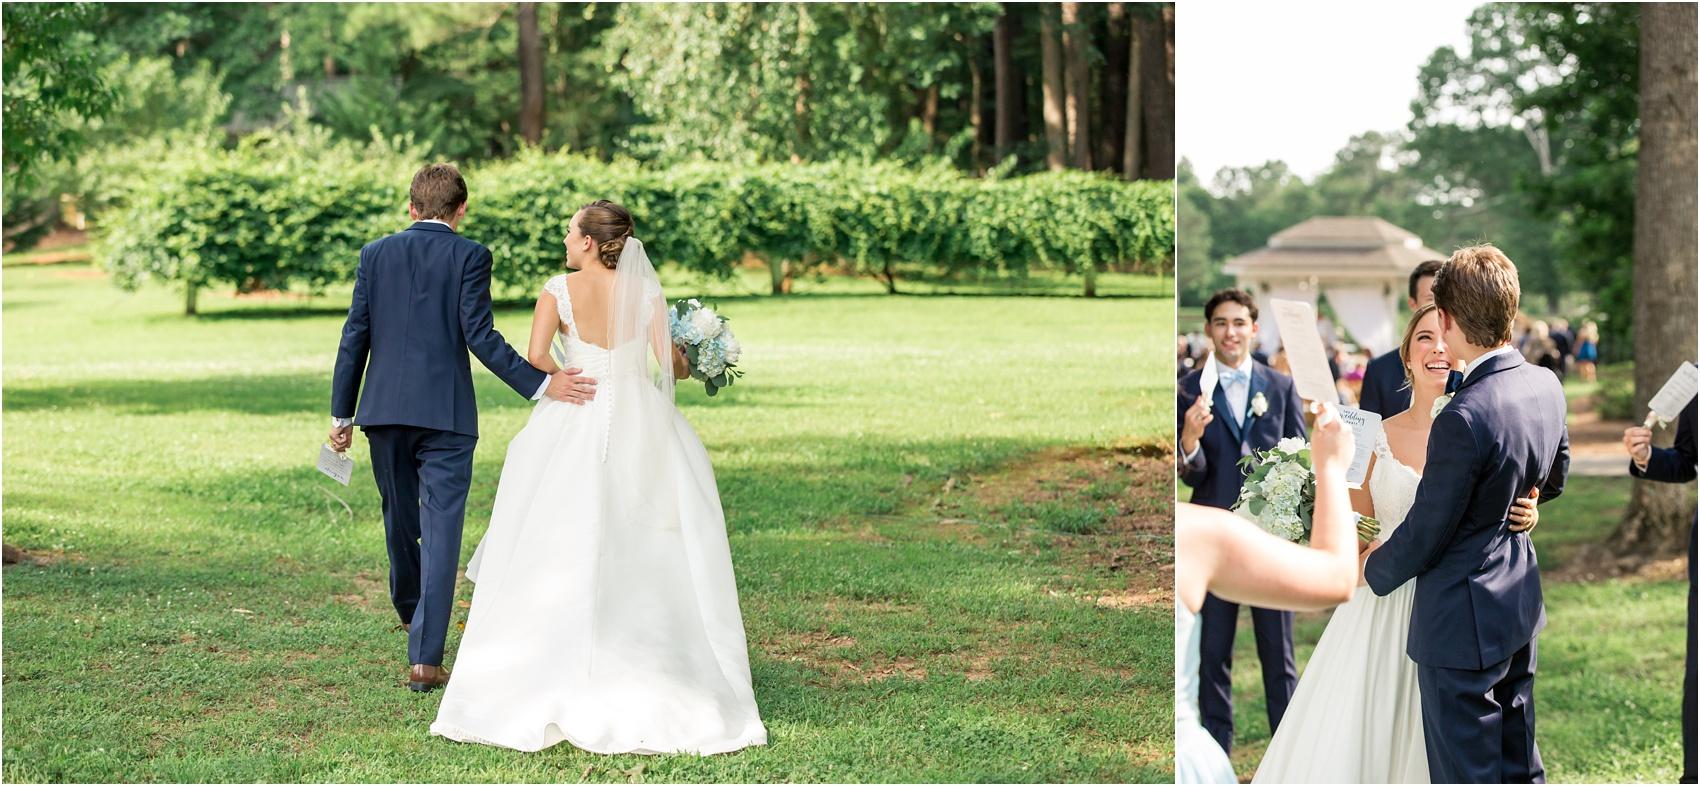 Savannah Eve Photography- Sigl-Adams Wedding- Sneak Peek-43.jpg